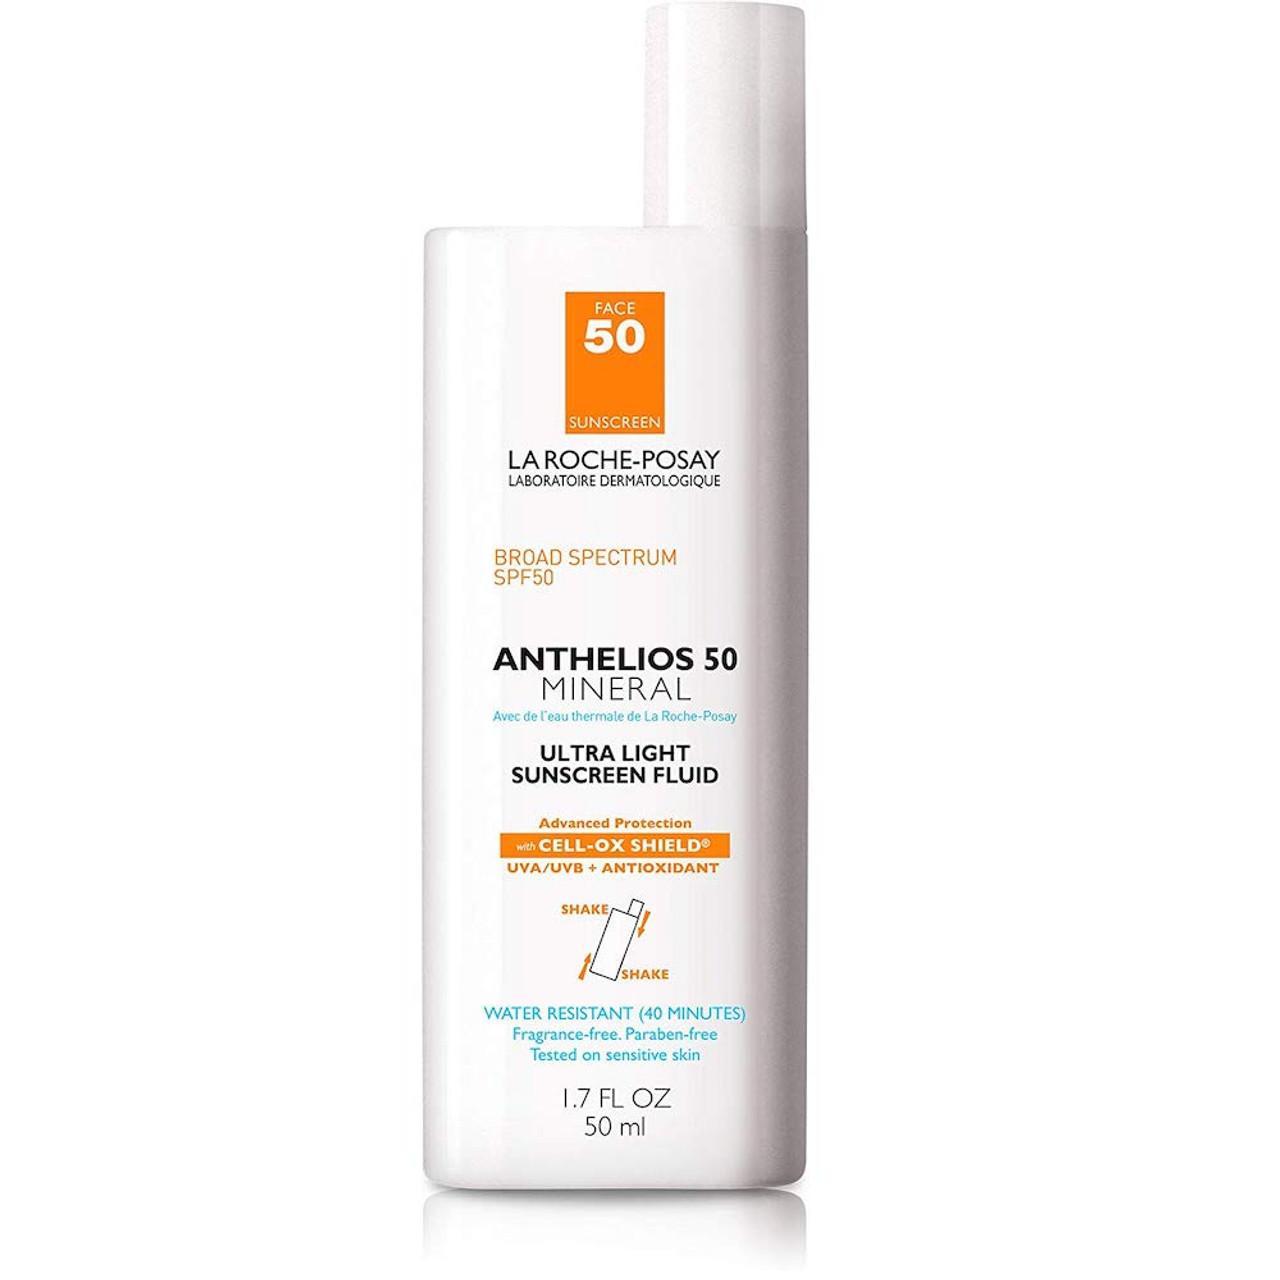 La Roche Posay Anthelios Mineral Sunscreen SPF 50 BeautifiedYou.com